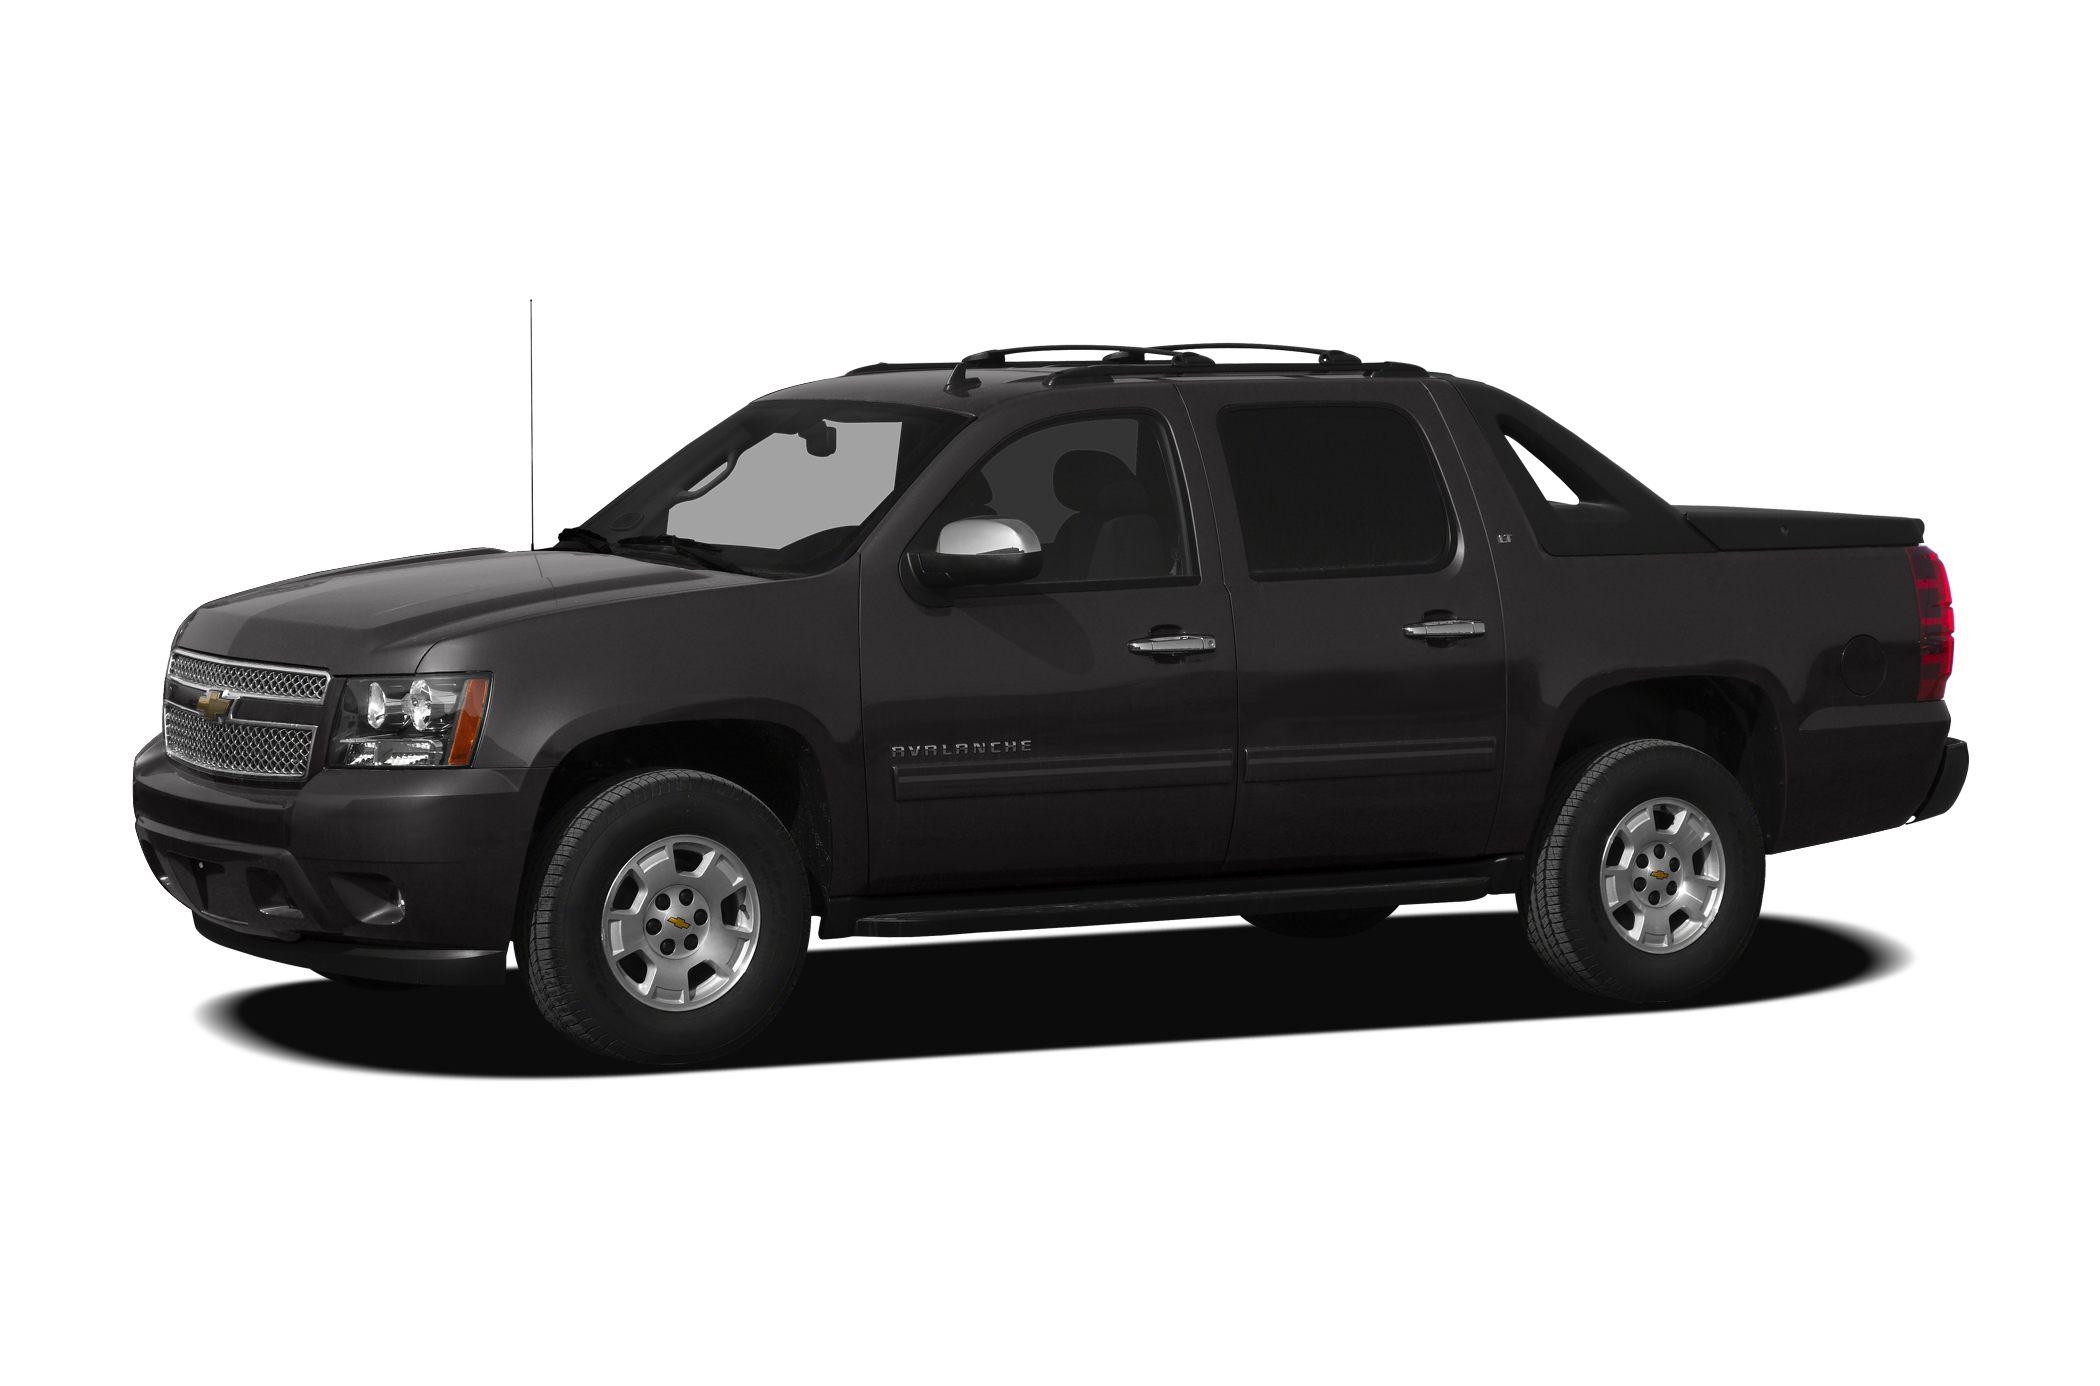 Kelebihan Chevrolet Avalanche Tangguh